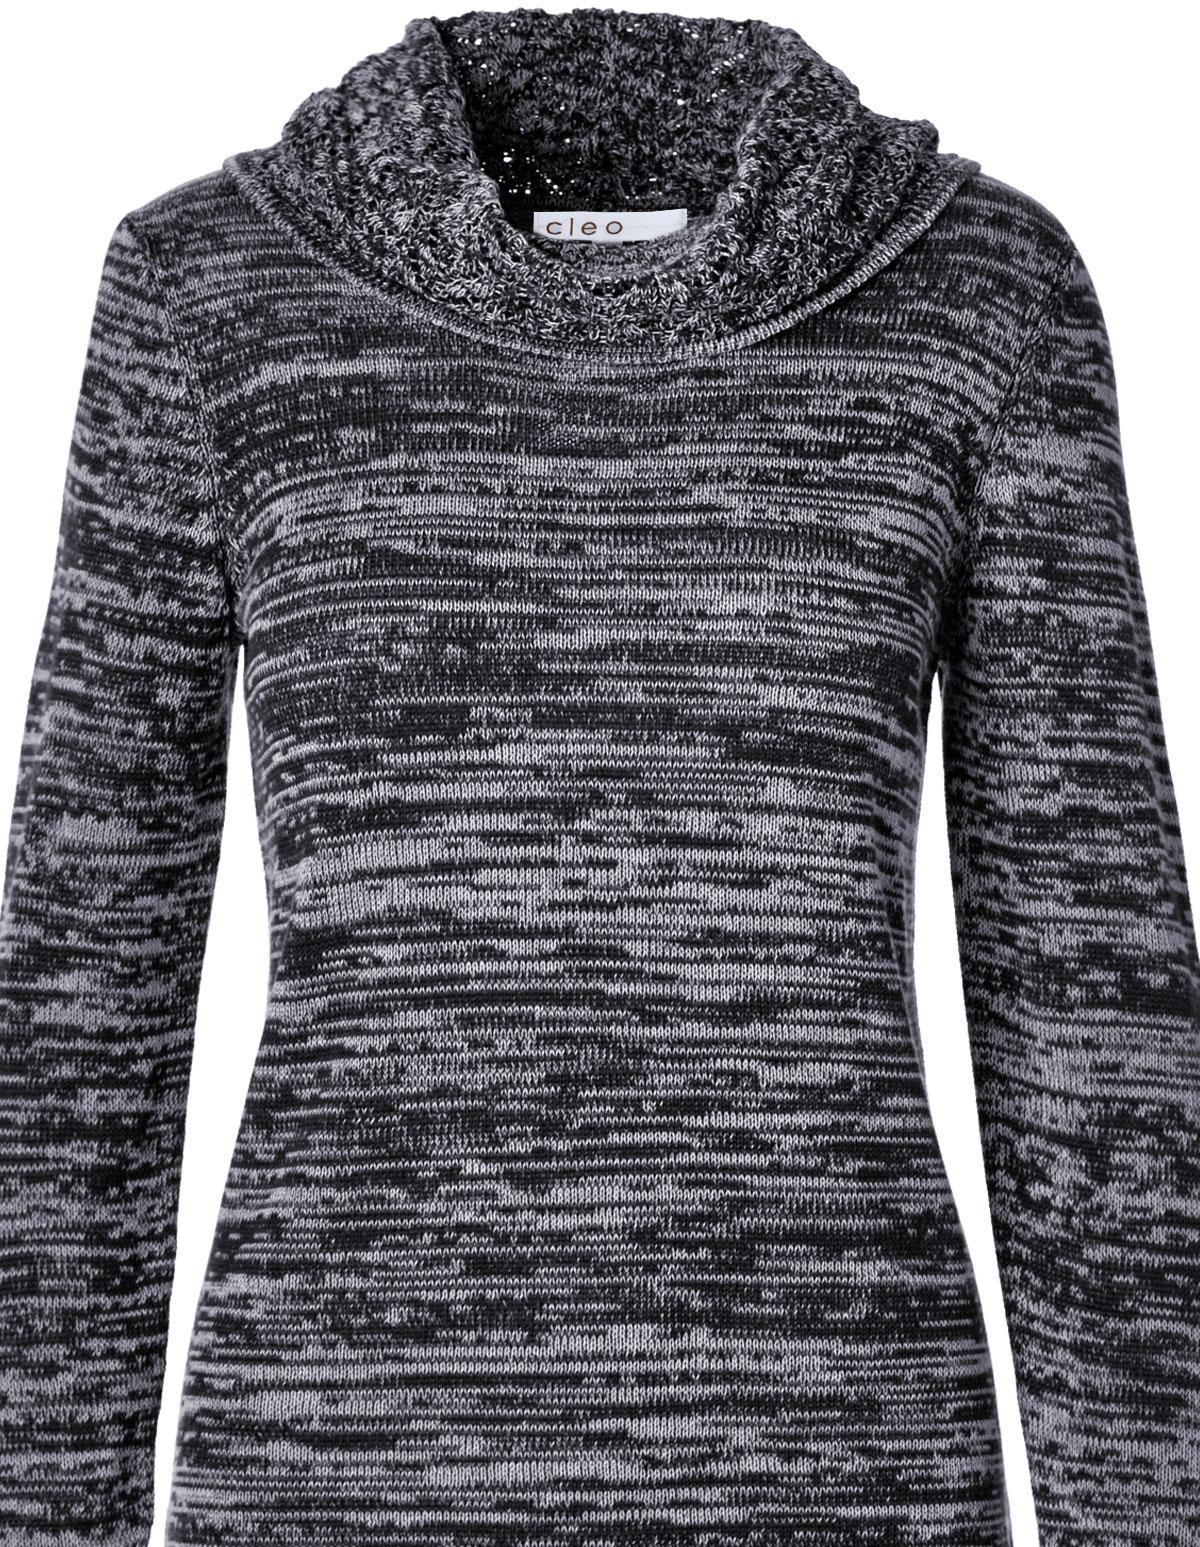 Navy Crochet Hem Sweater | Cleo